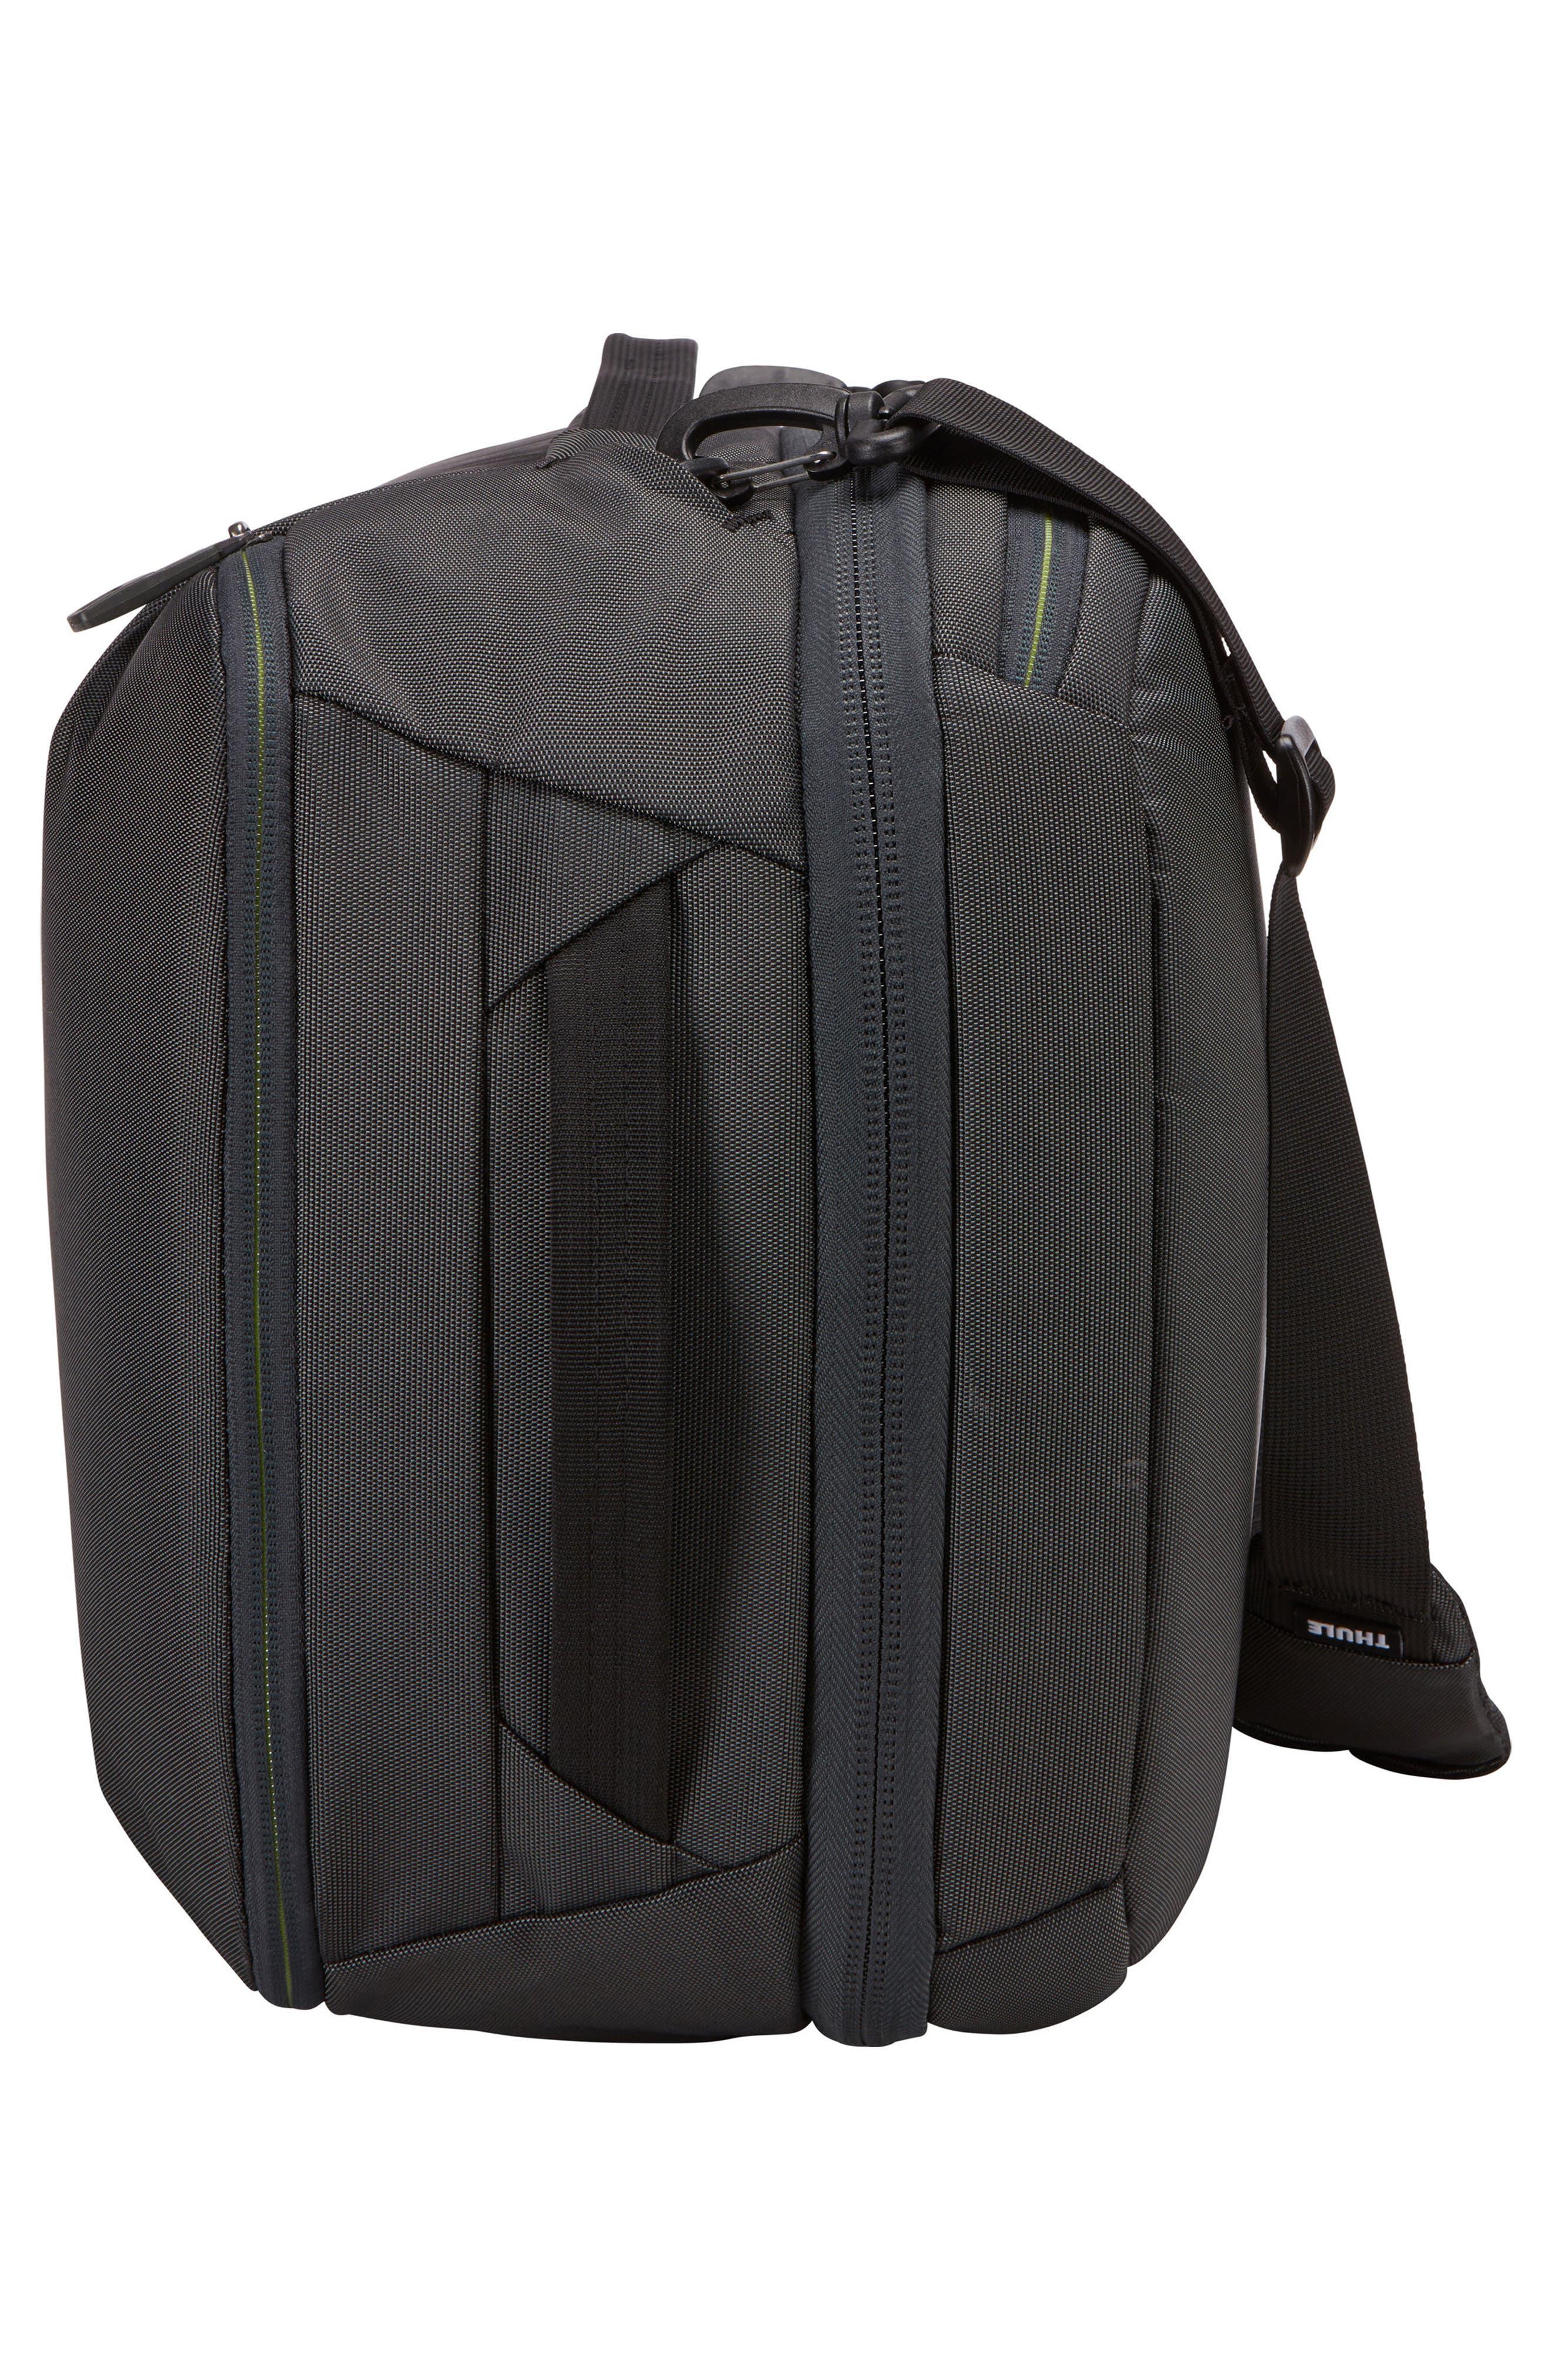 Subterra 40-Liter Convertible Duffel Bag,                             Alternate thumbnail 3, color,                             DARK SHADOW